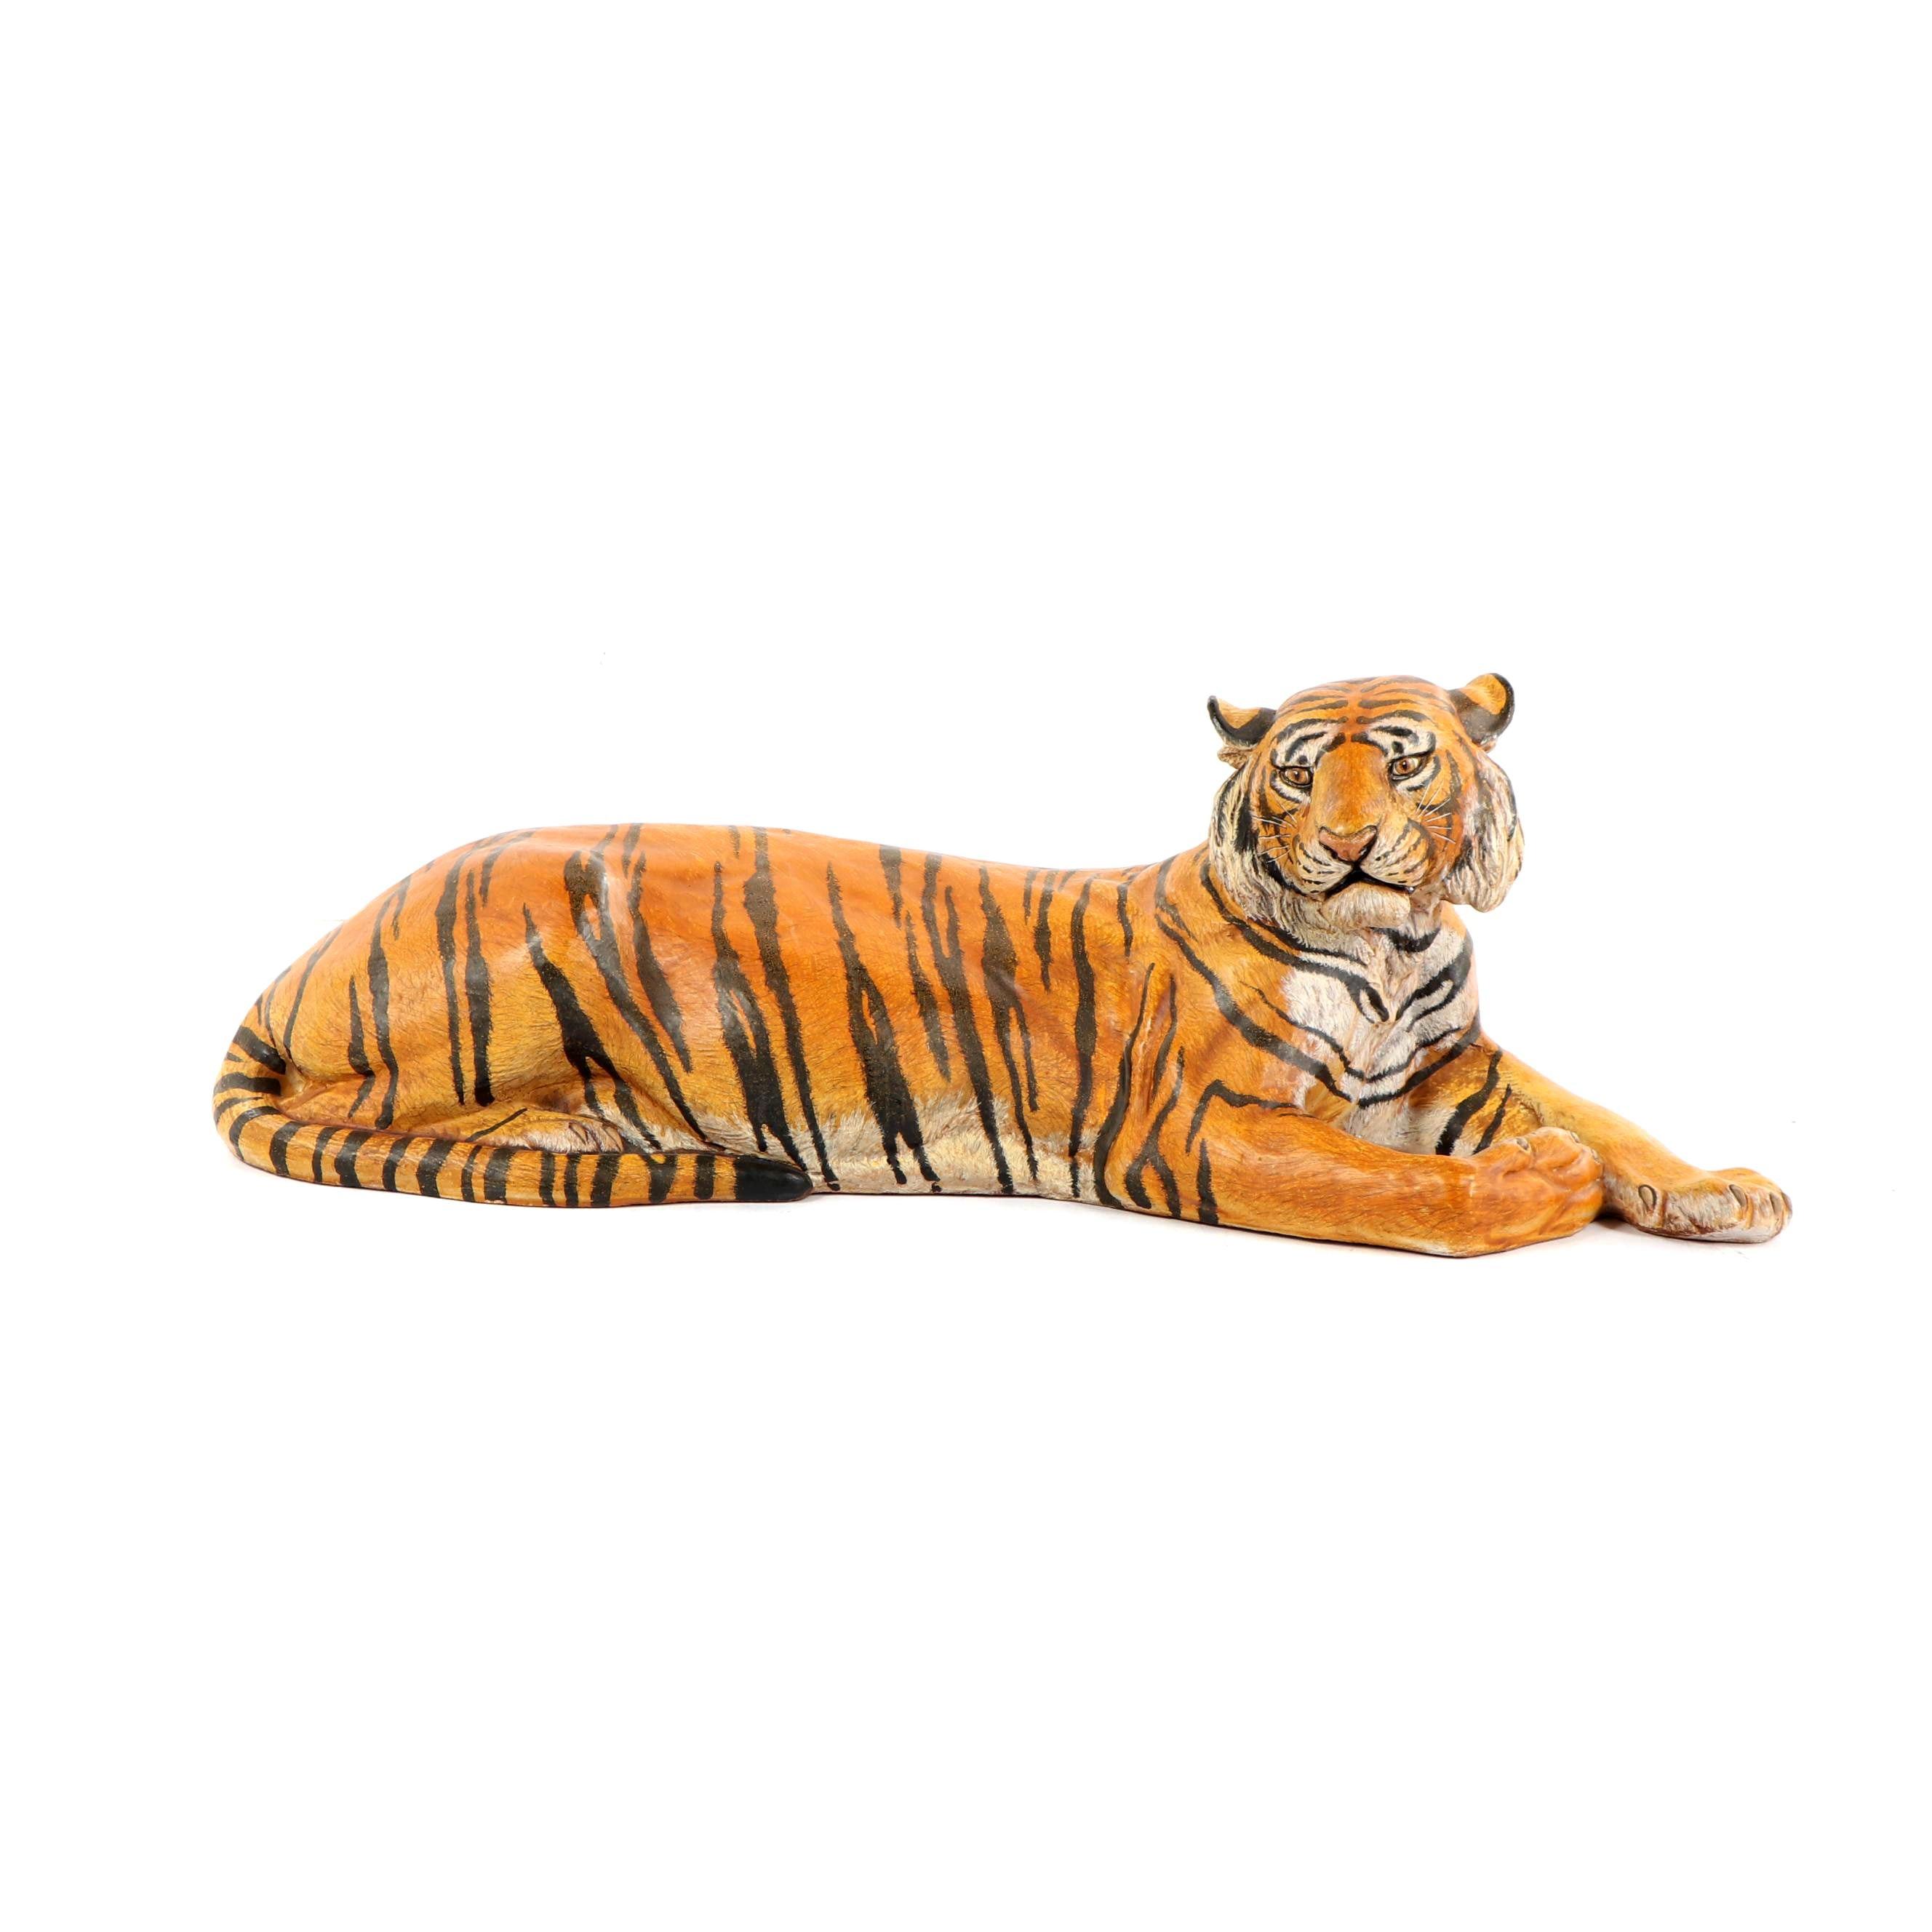 Italian Hand-Painted Terracotta Tiger Sculpture